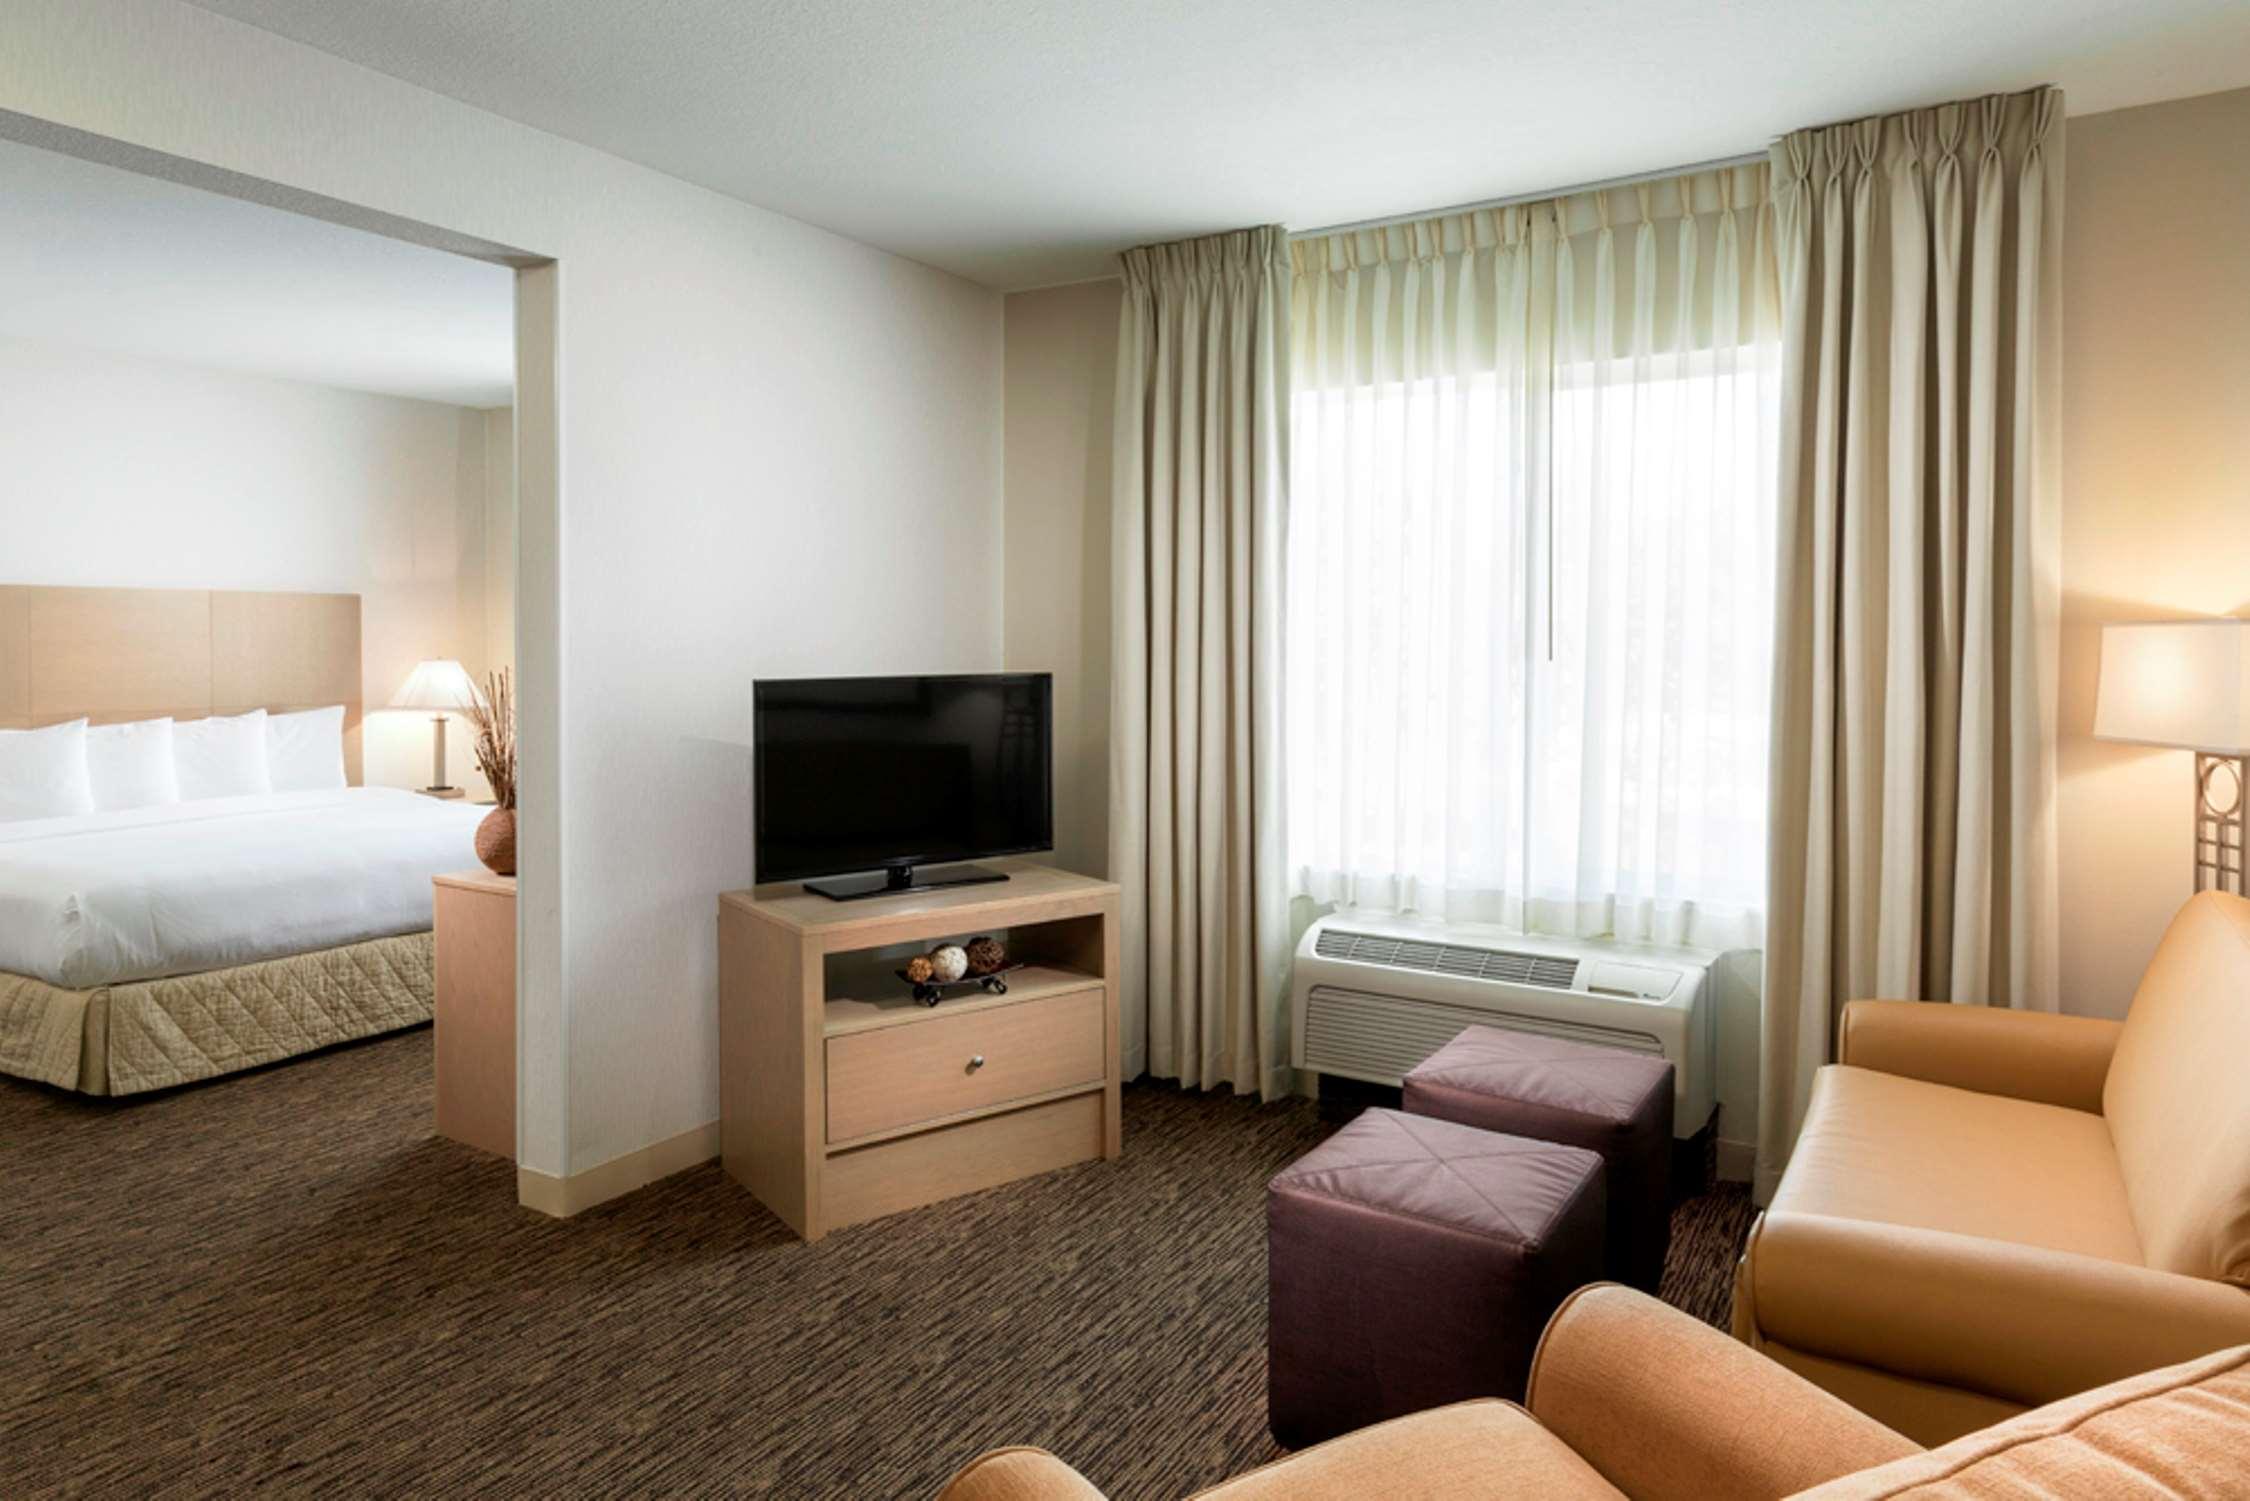 DoubleTree by Hilton Hotel Vancouver, Washington image 9